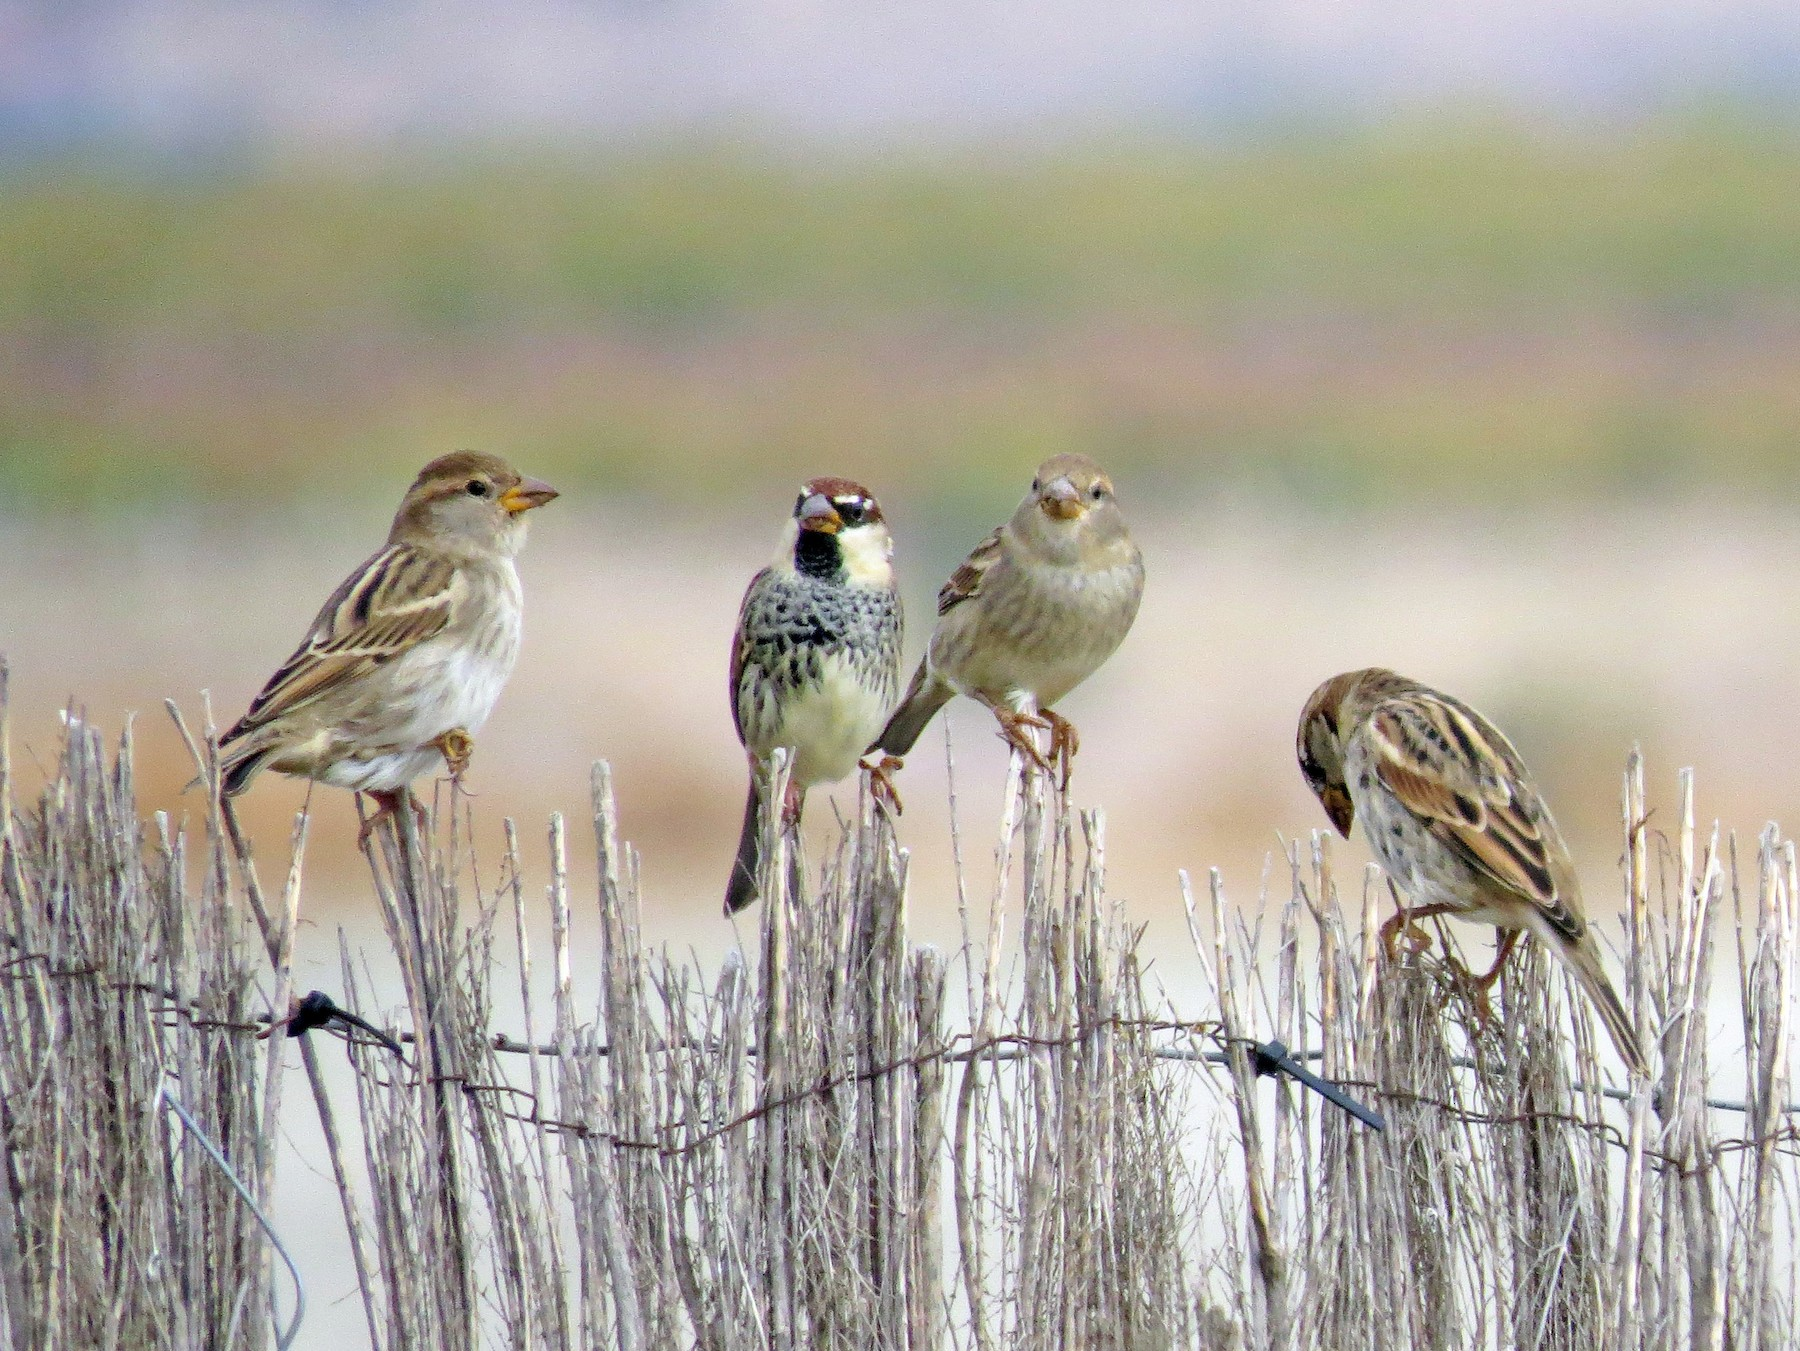 Spanish Sparrow - Jose Vicente Navarro San Andrés